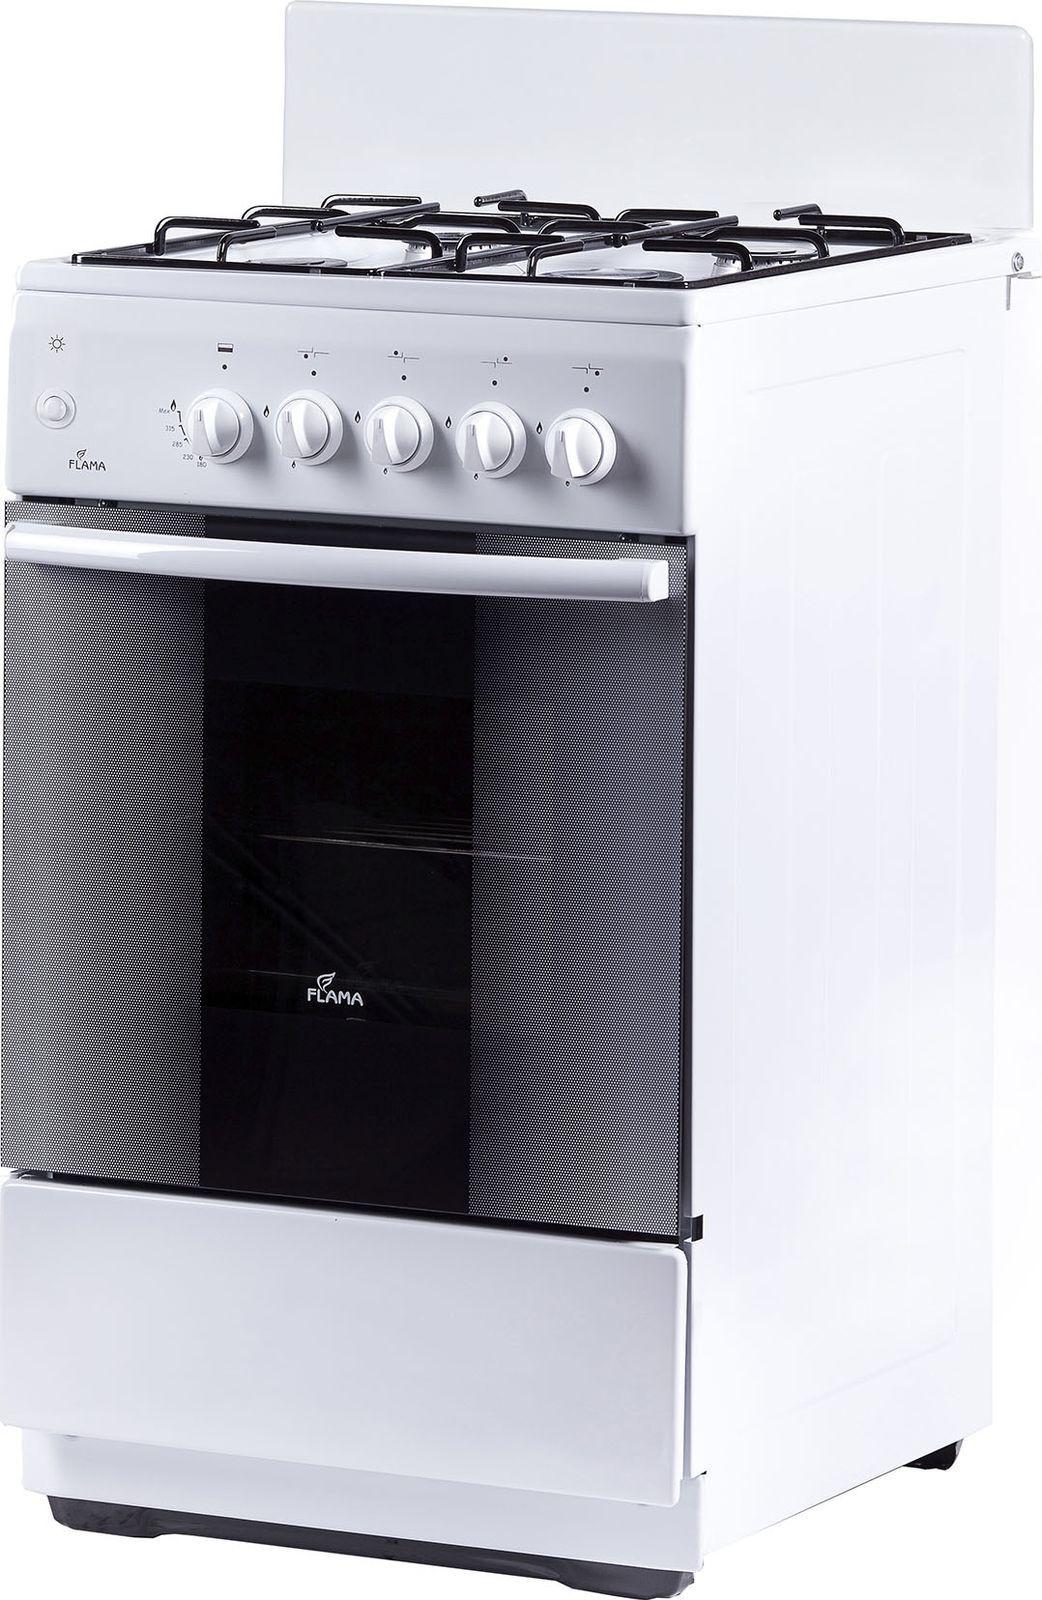 Кухонная плита Flama AK 1416 W, белый